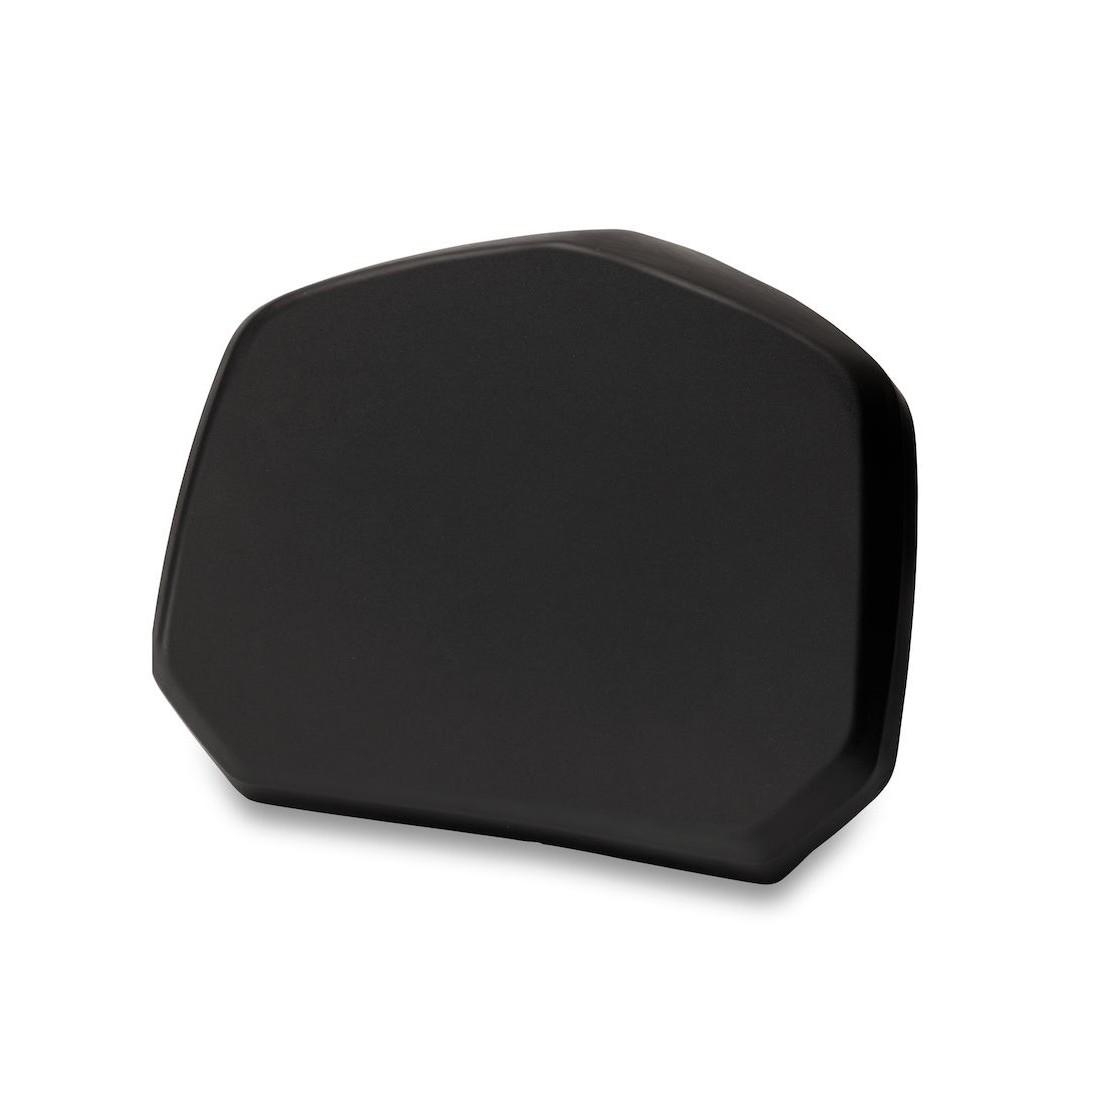 Respaldo Maleta Top Case Yamaha 50L Negro